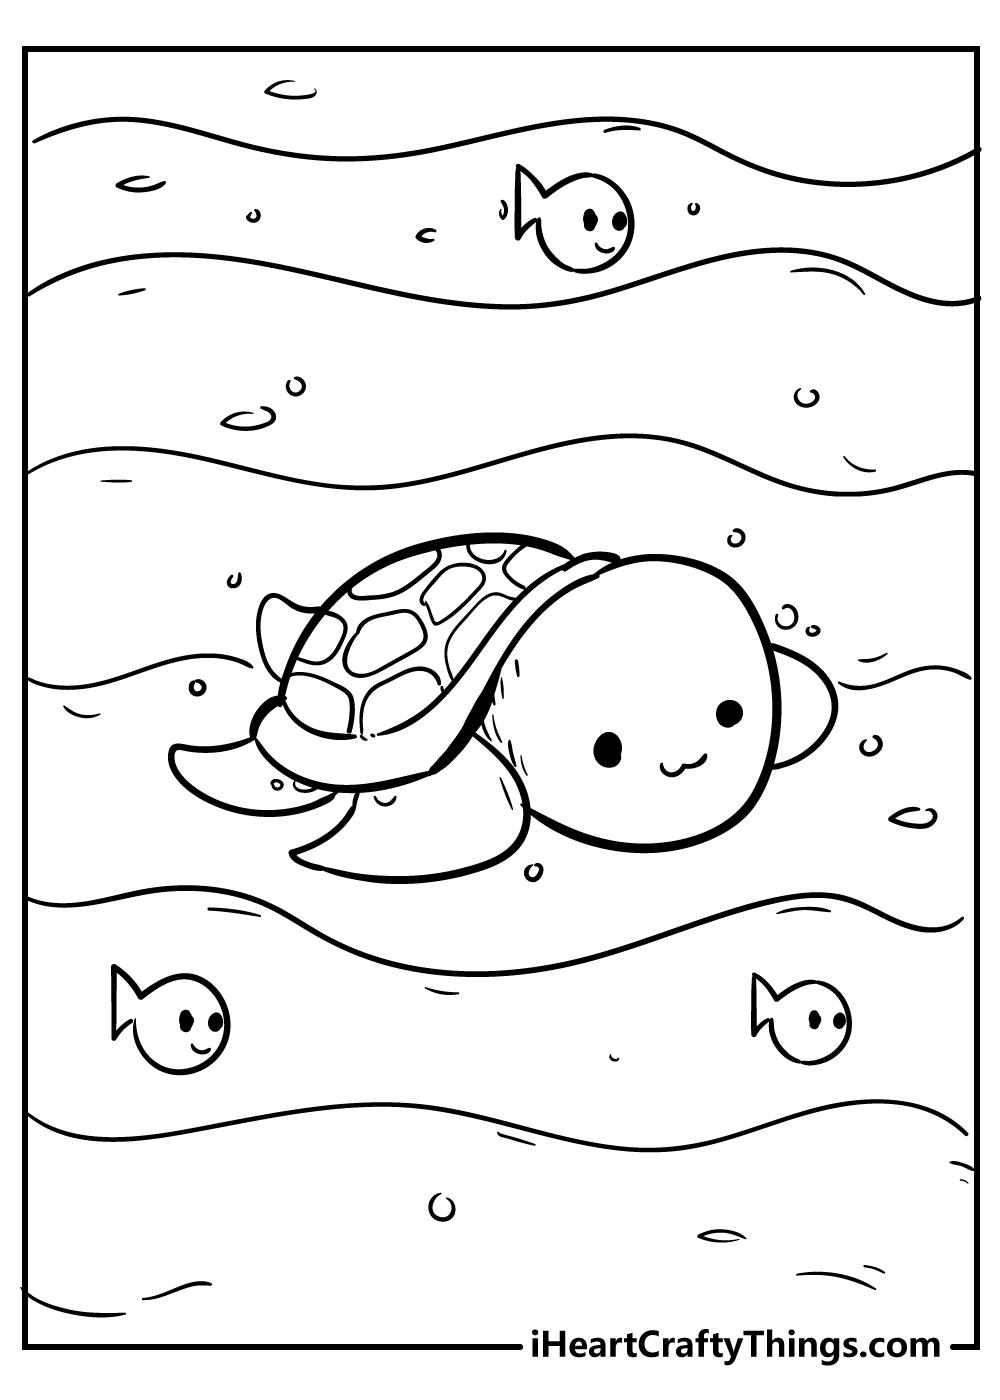 kawaii coloring pages i can print